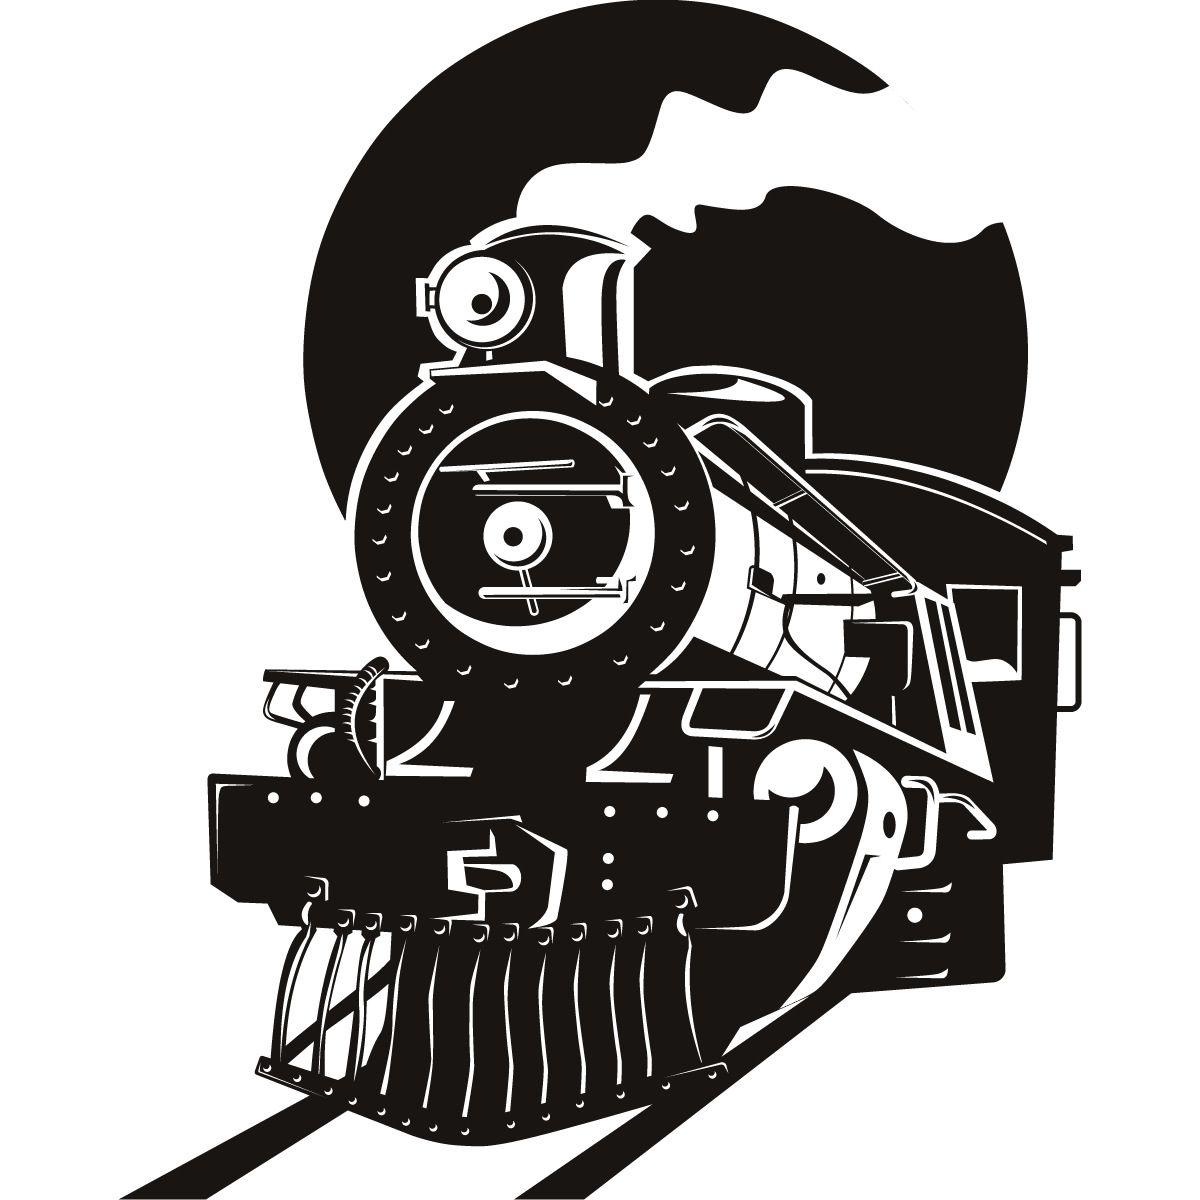 Steam Locomotive Silhouette Steam locomotive silhouette.